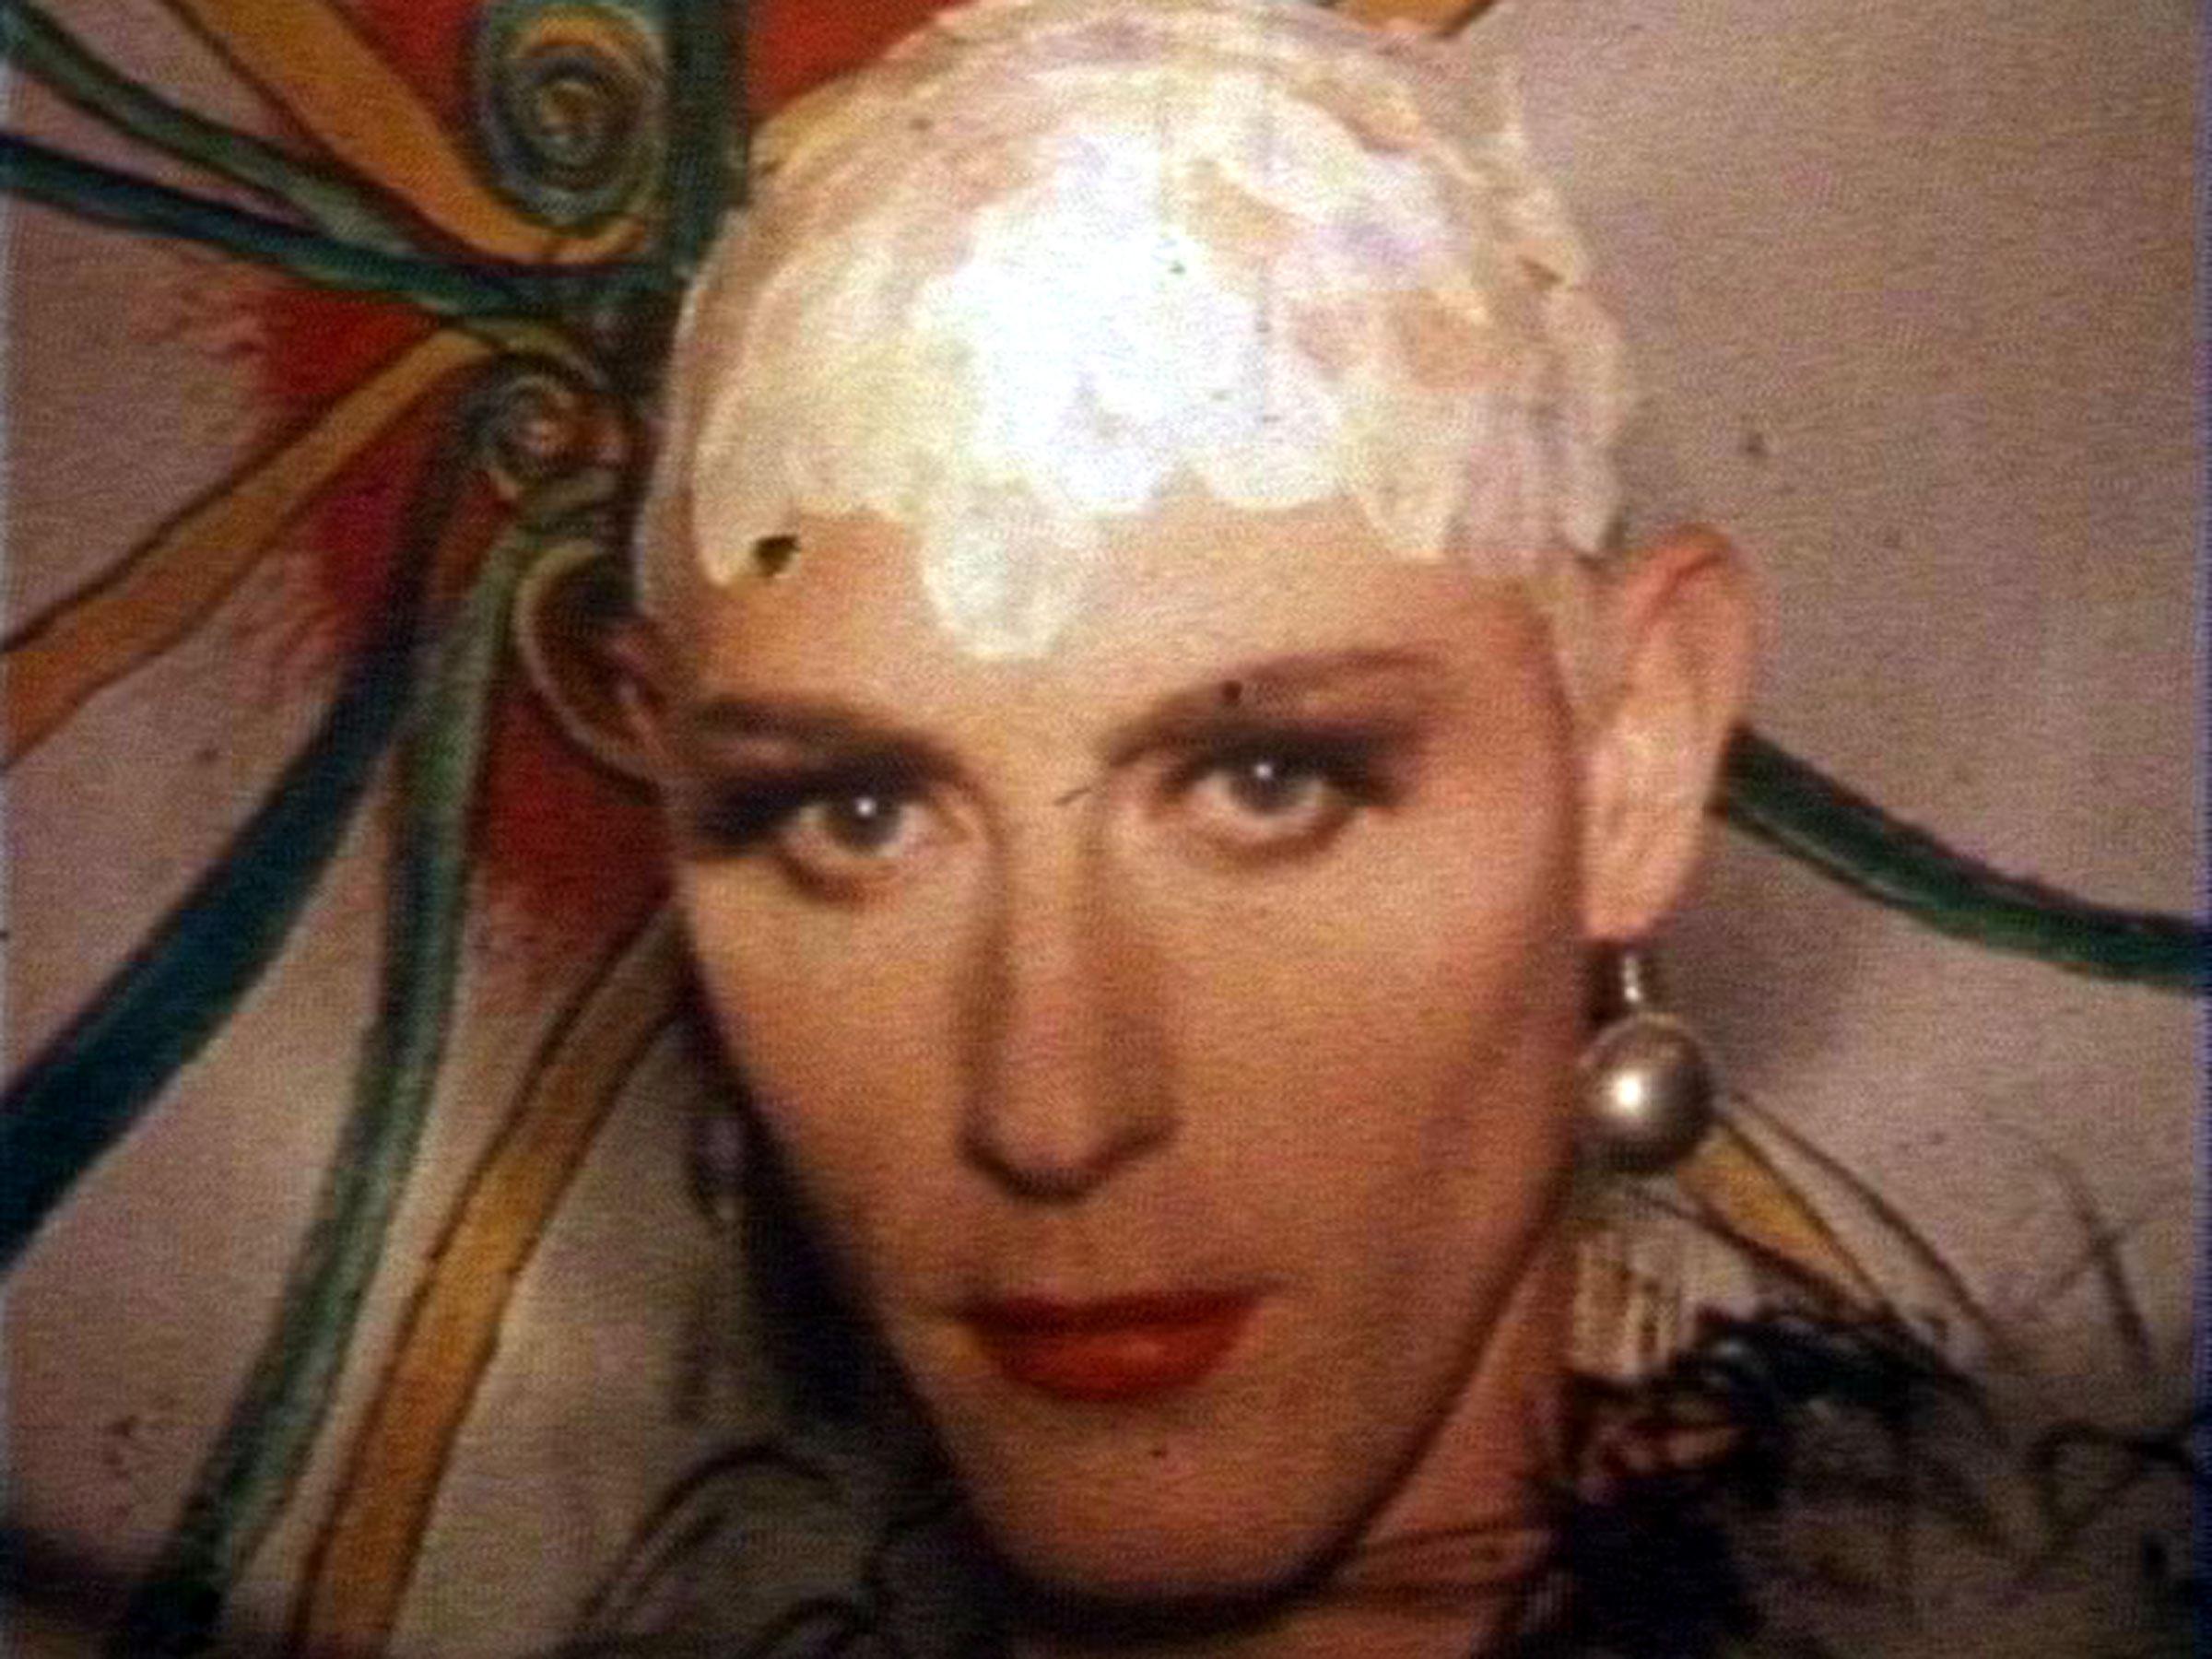 1989-12-12-SF-Kinkys-tv01-Paul